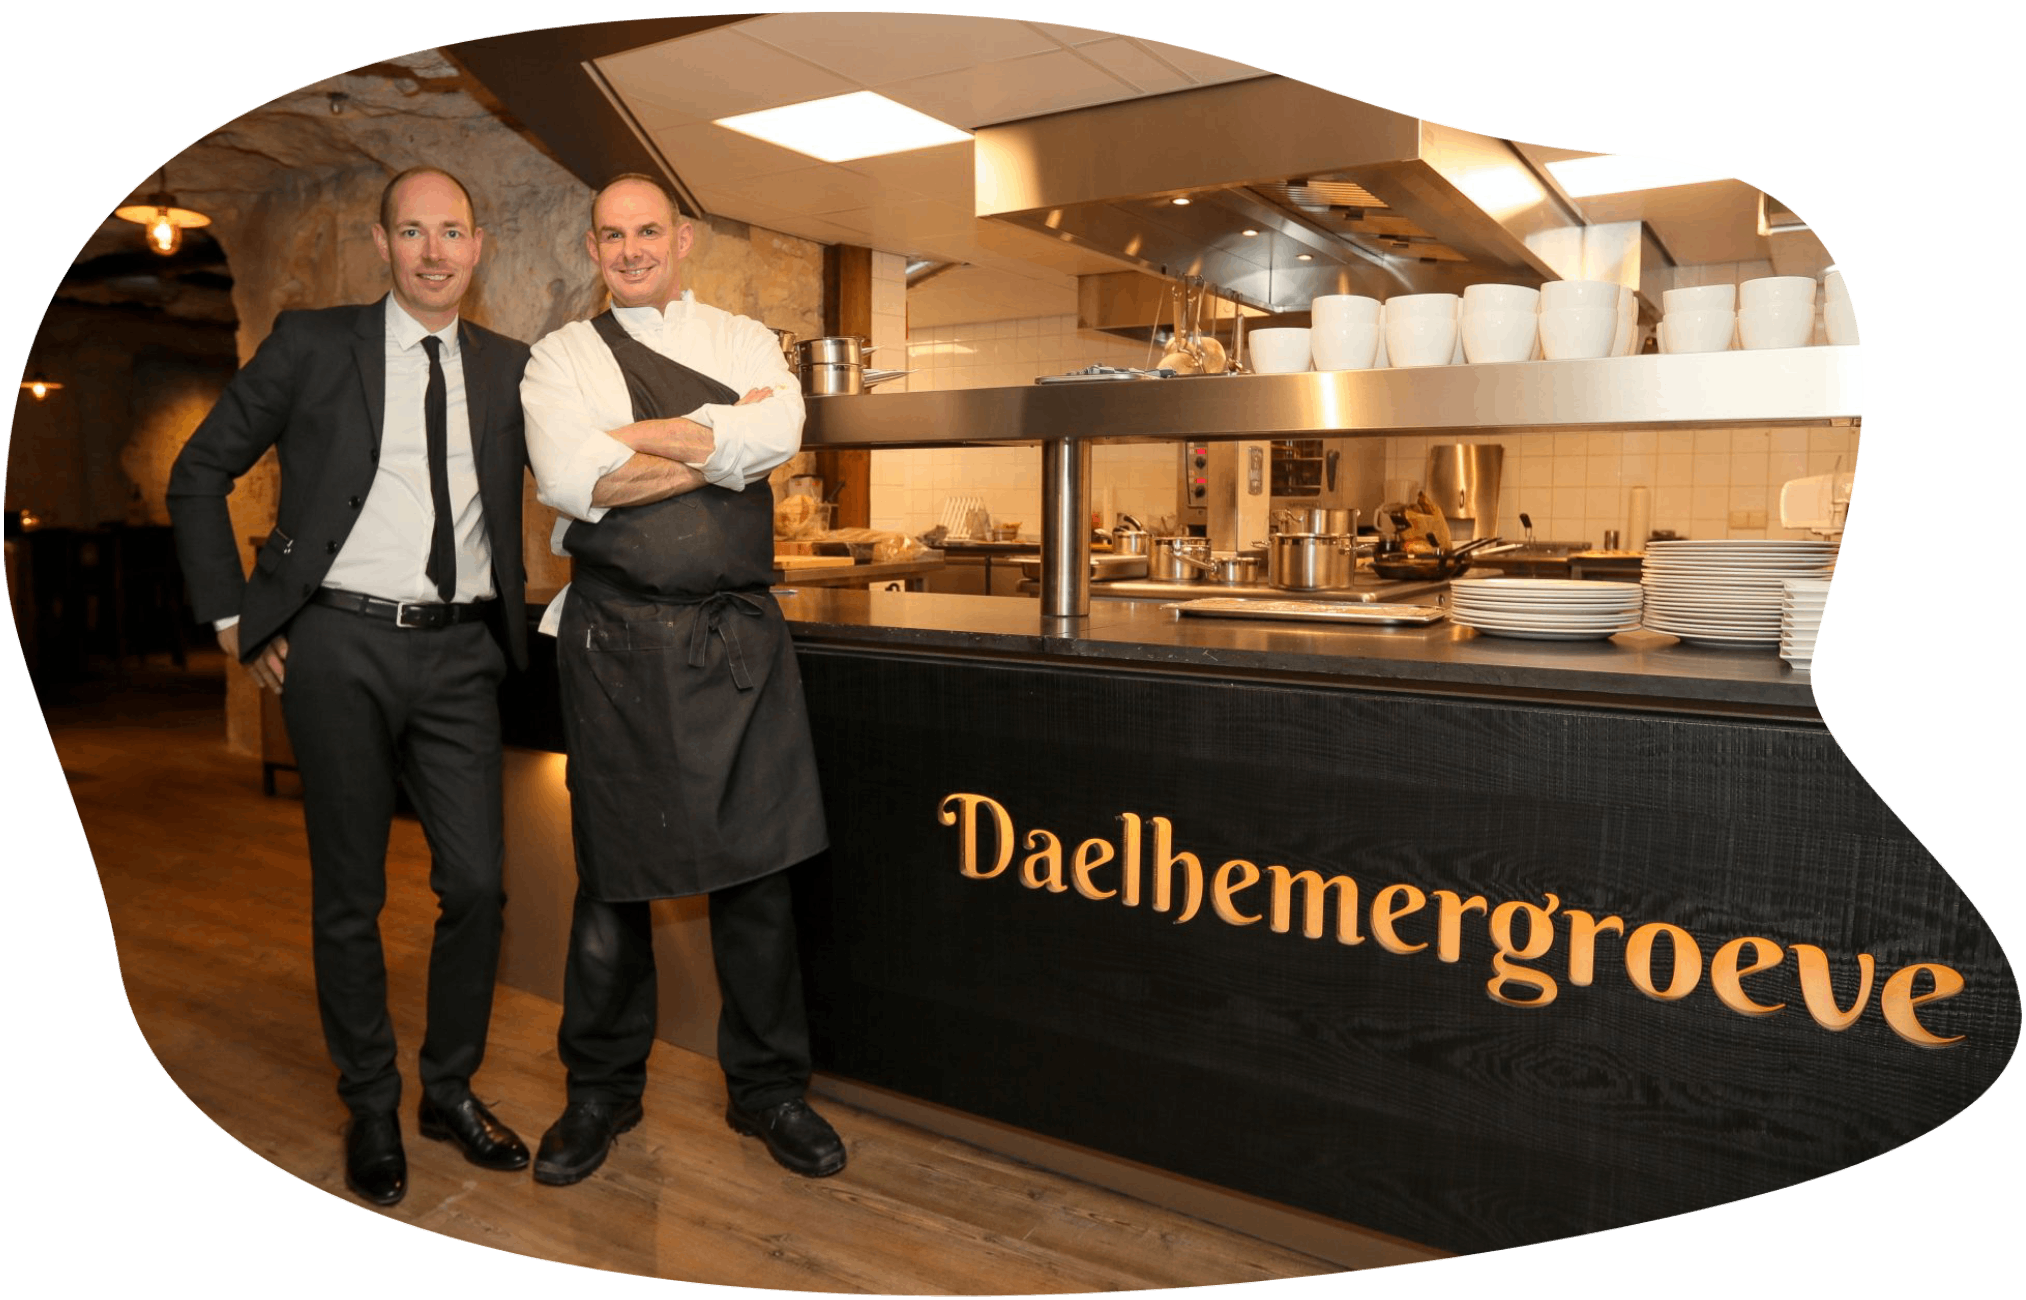 Brasserie Daelhemergroeve